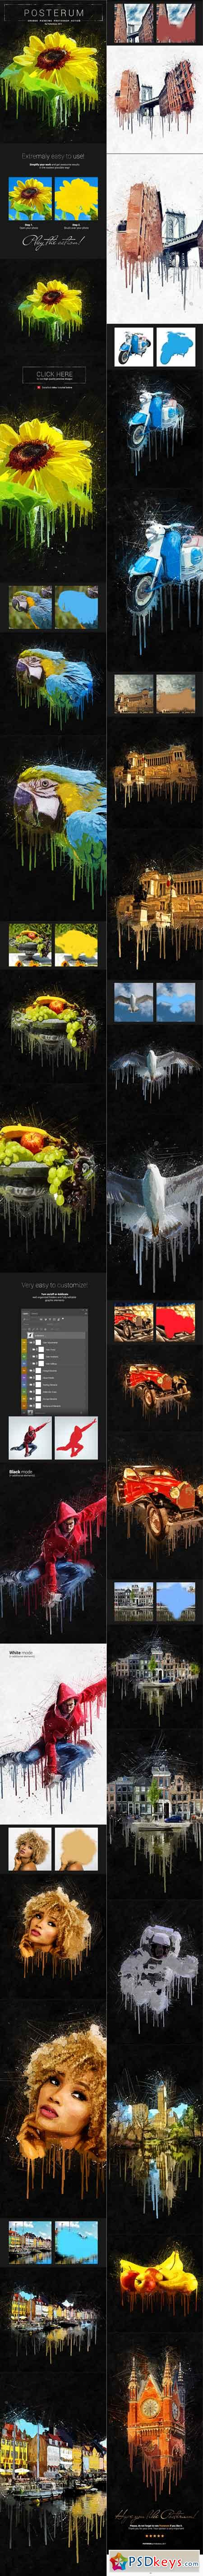 Posterum - Grunge Painting Photoshop Action 19648349